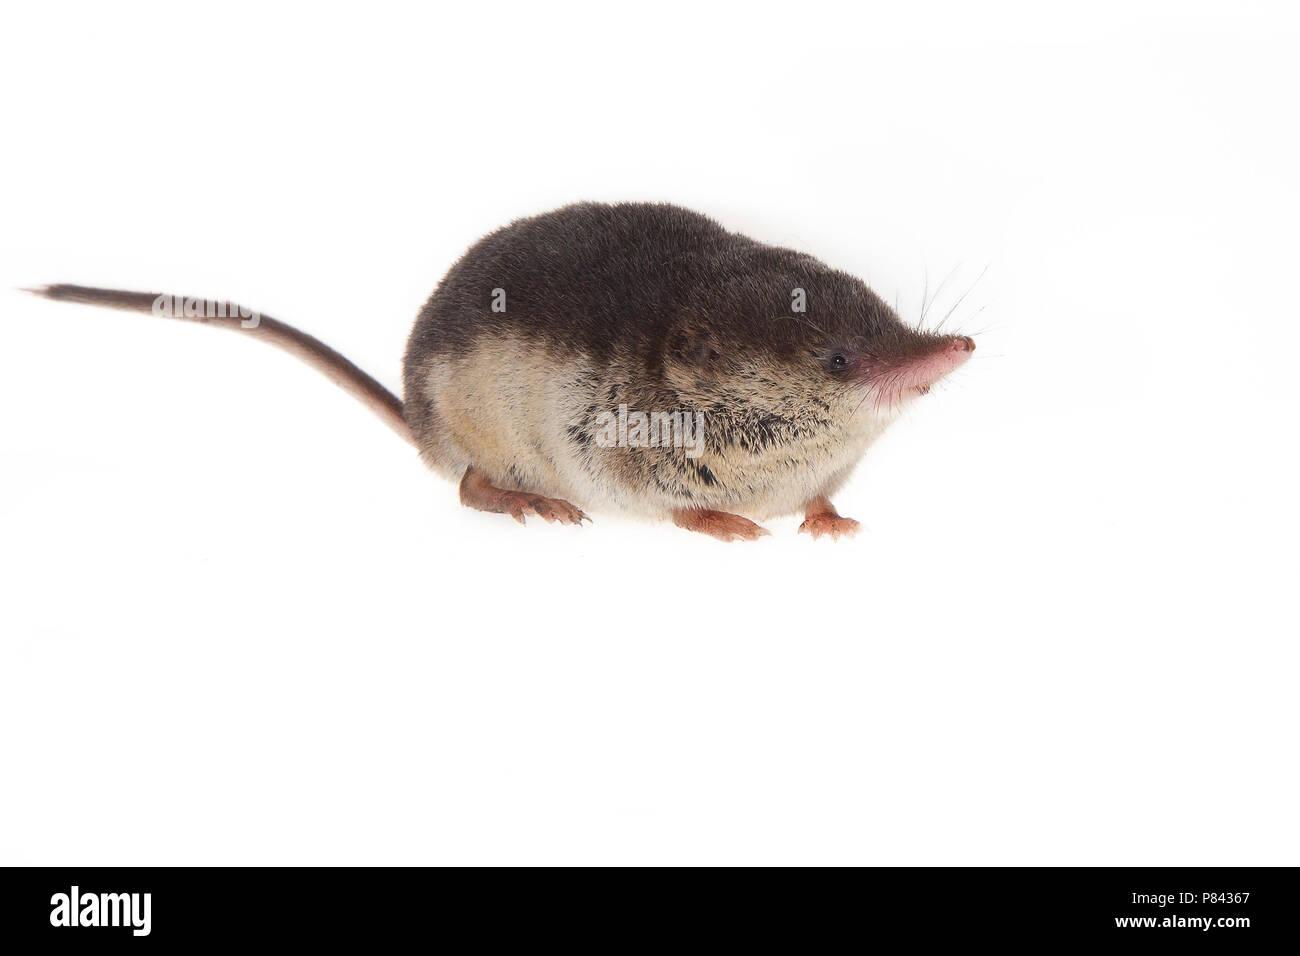 Bosspitsmuis, Common Shrew (Sorex araneus) - Stock Image